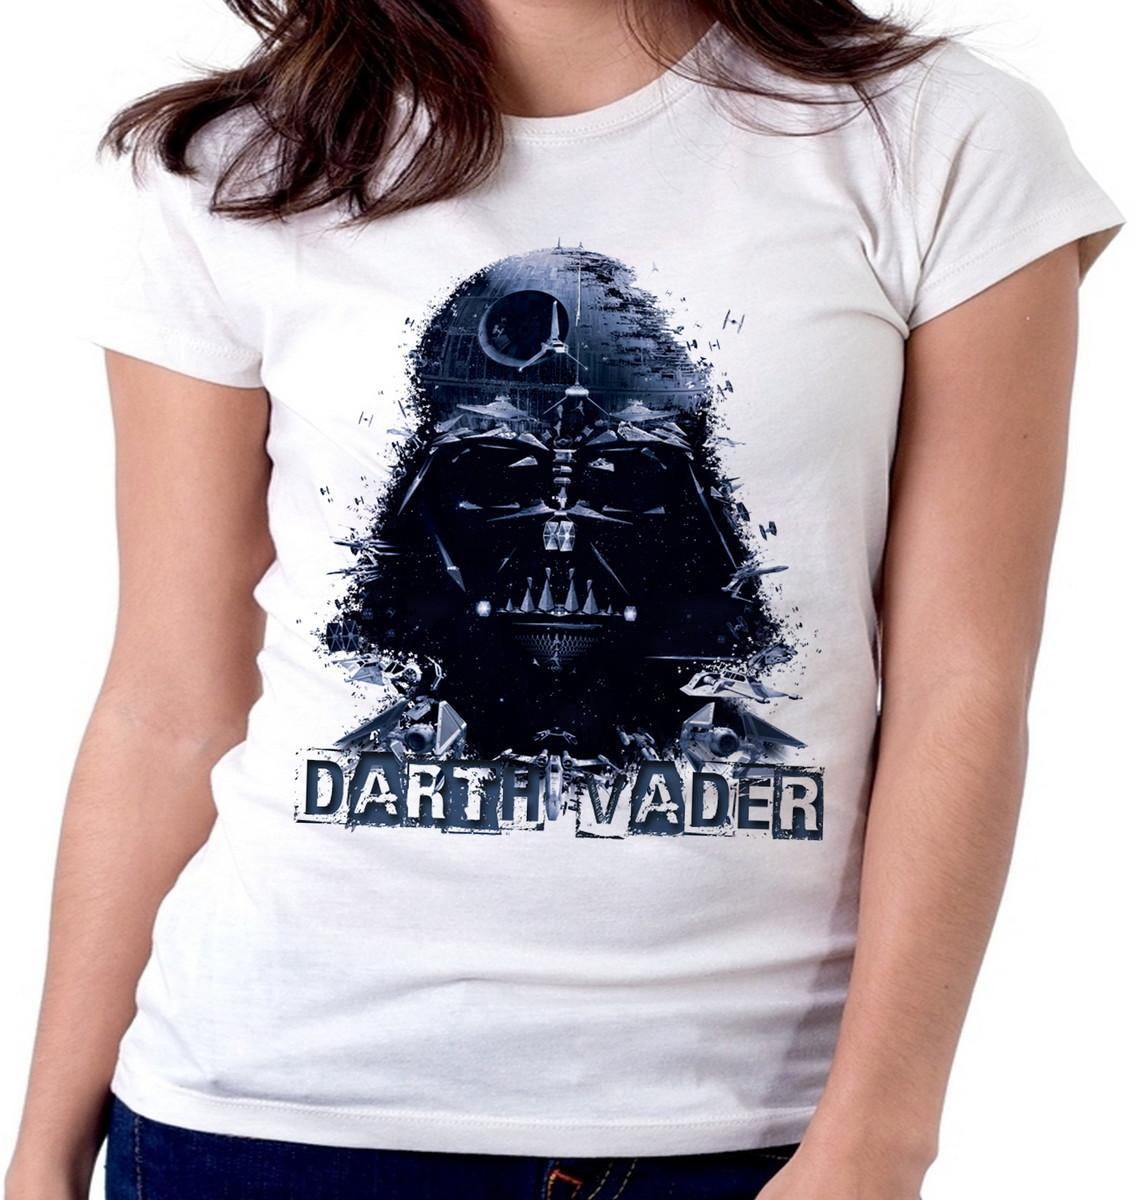 5c3fa99b1 Blusa feminina baby look camiseta Darth Vader star wars jedi no Elo7 ...